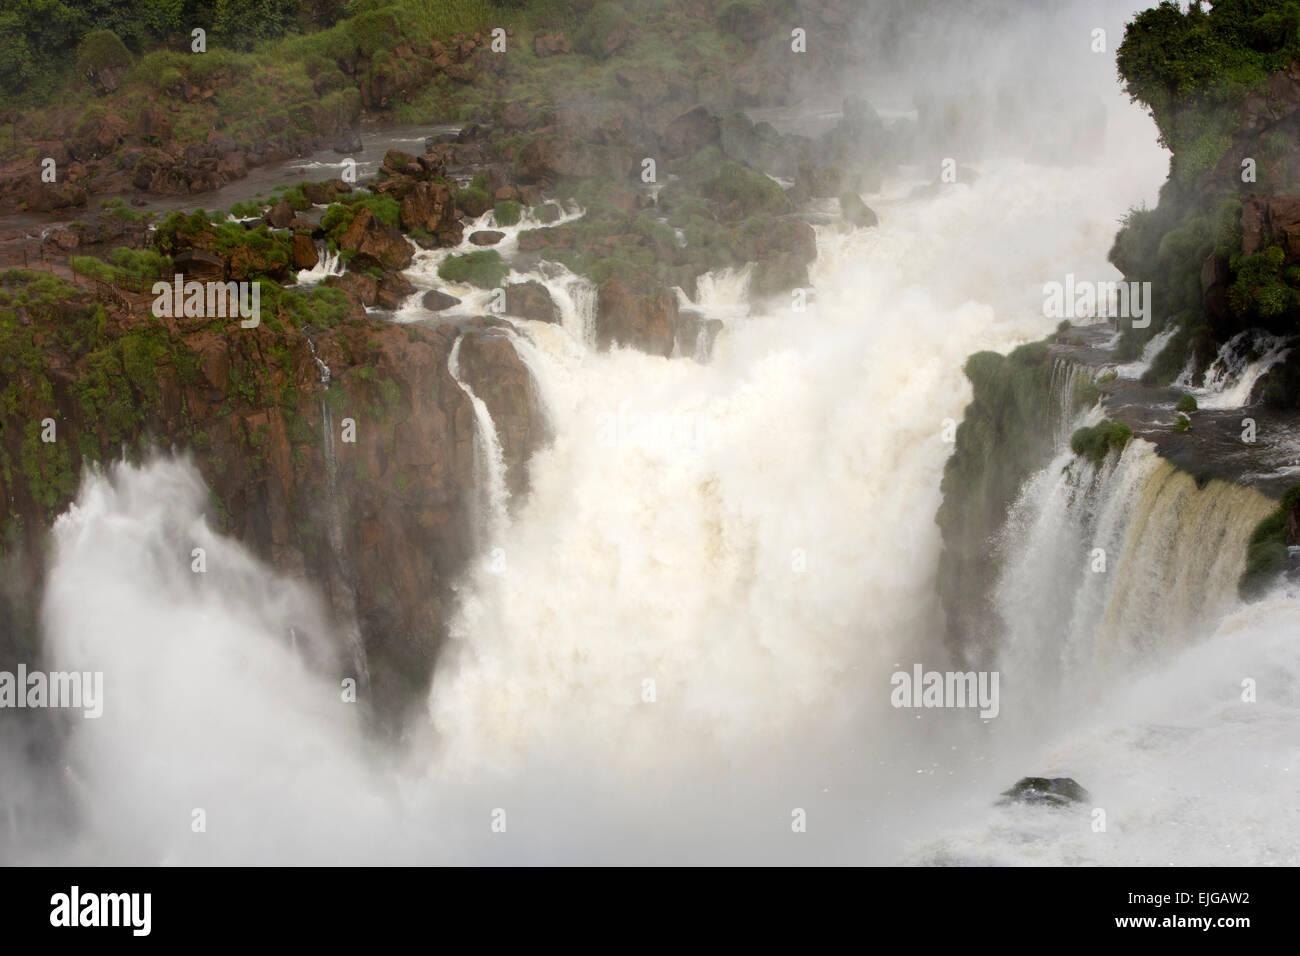 Argentina, Iguazu Falls, Isla San Martin Island and water flowing over waterfalls after heavy rain - Stock Image